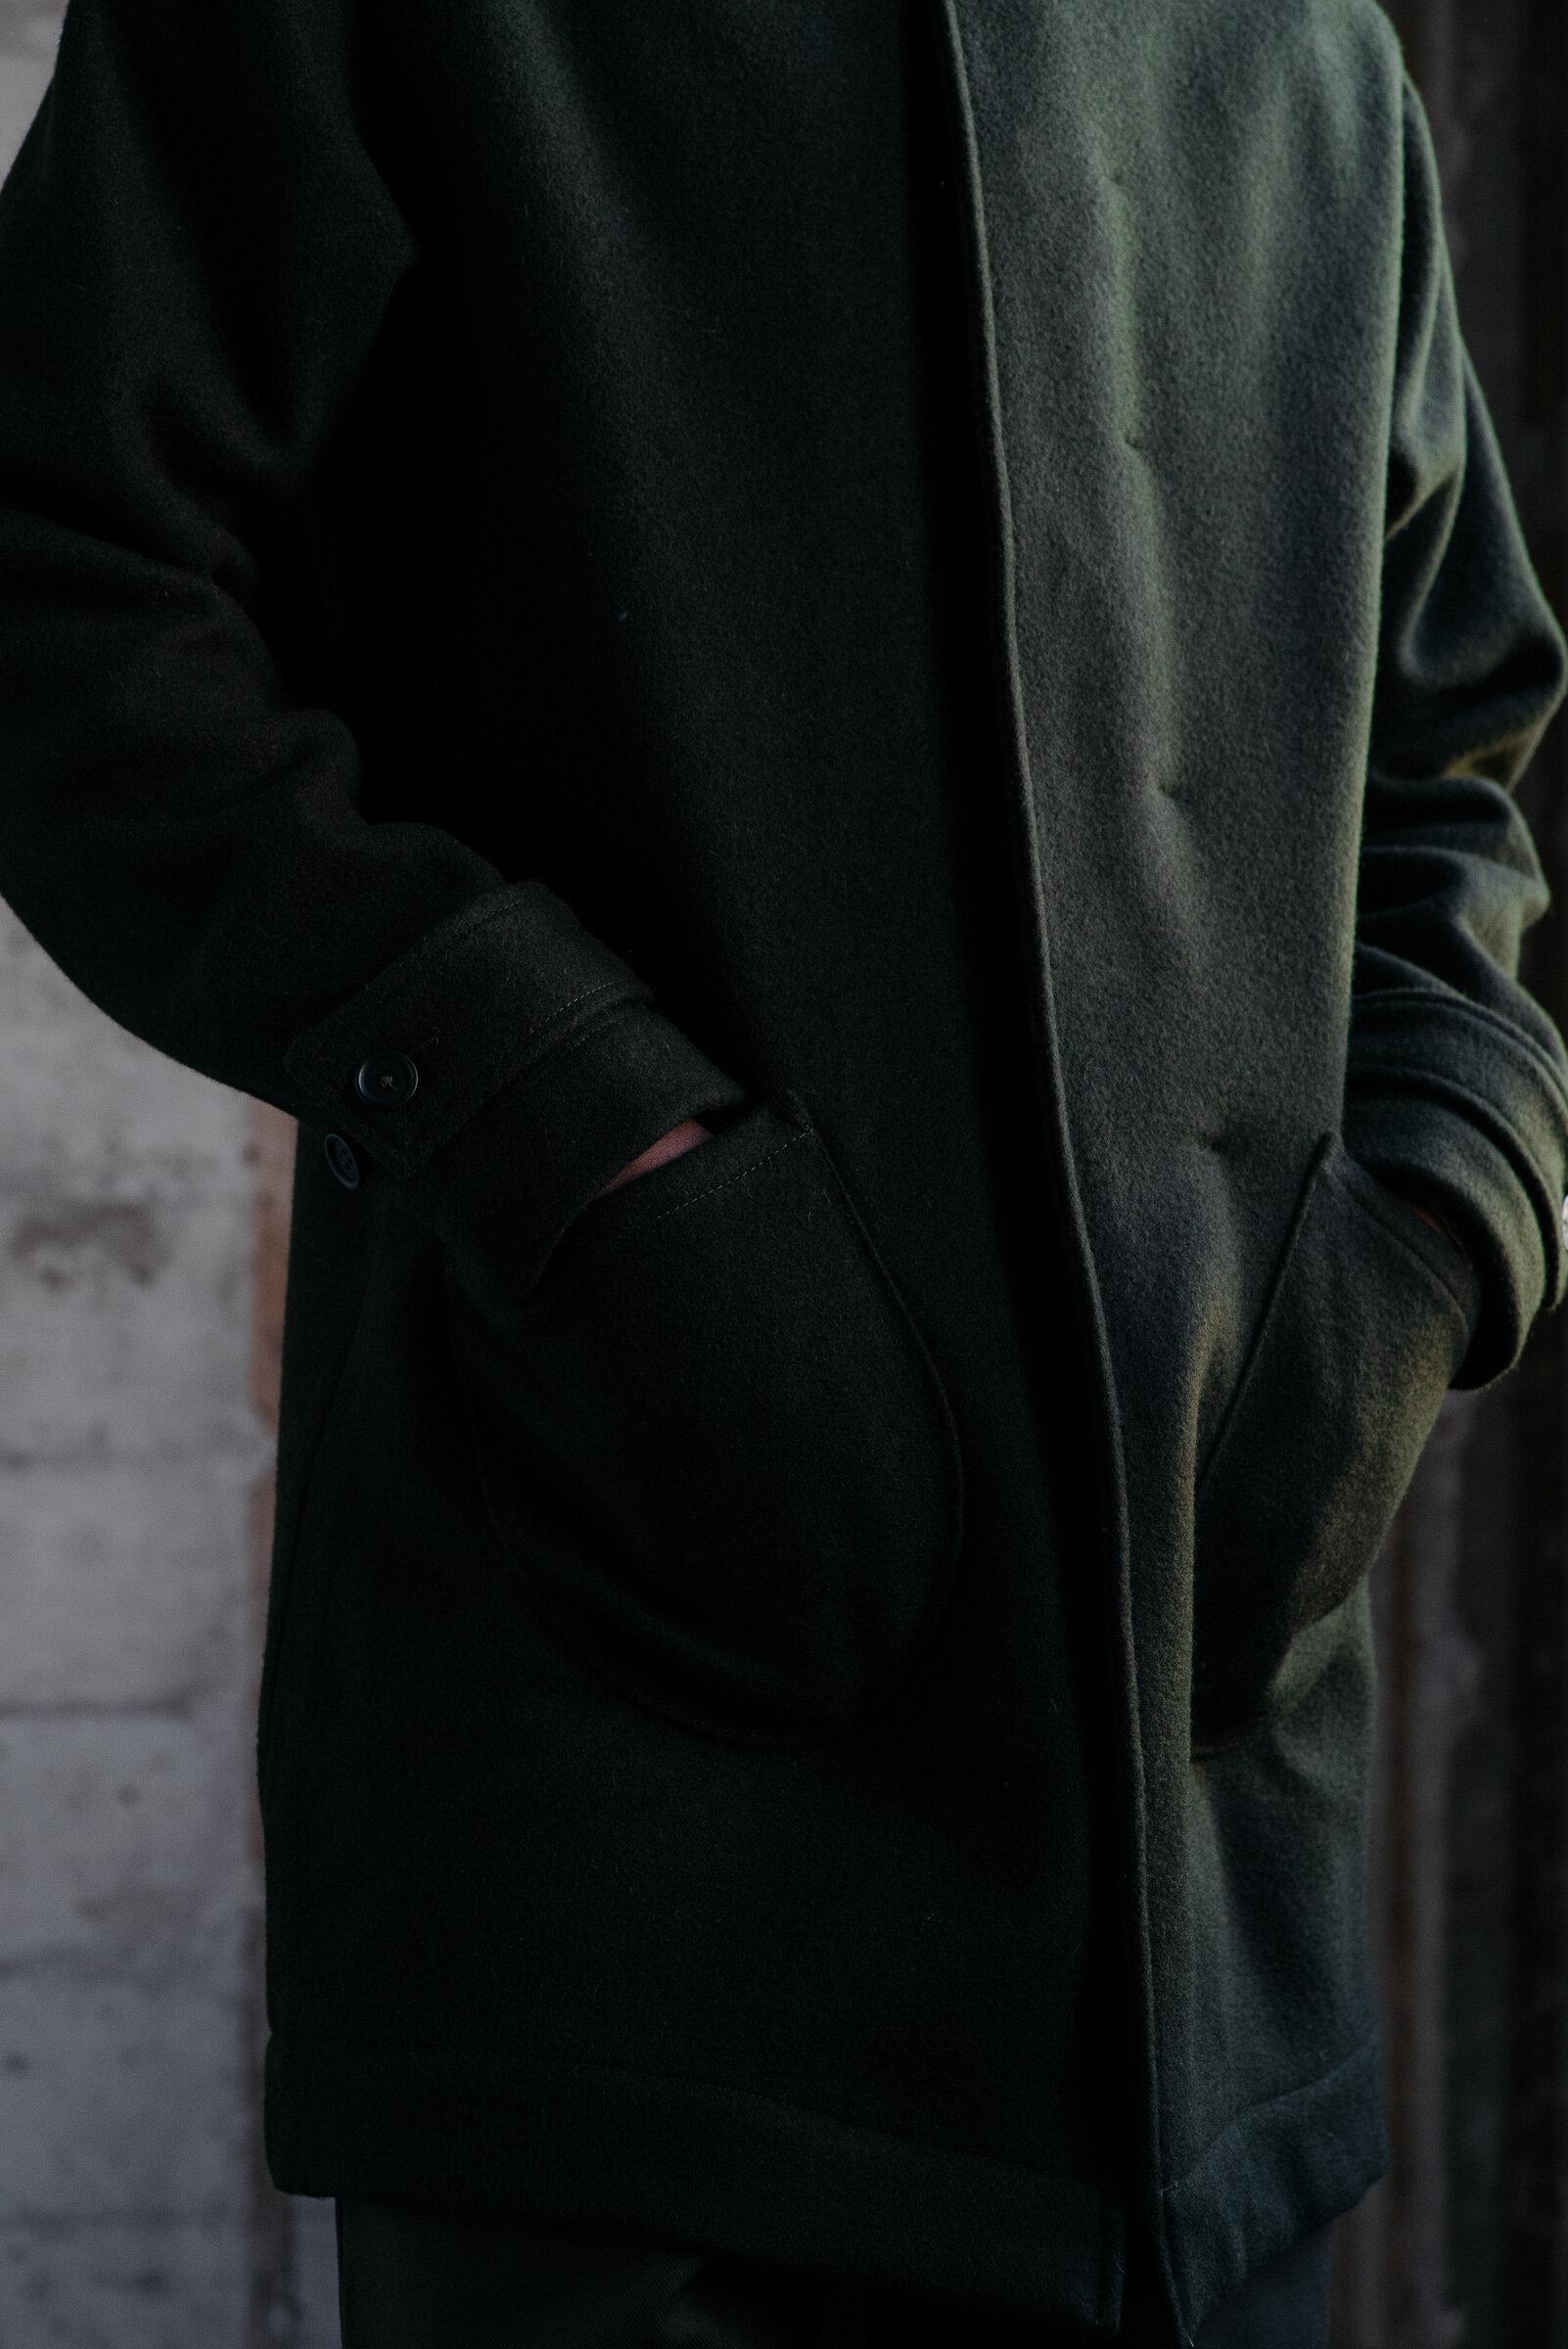 evan-kinori-covered-placket-coat-melton-wool-woven-in-japan-6